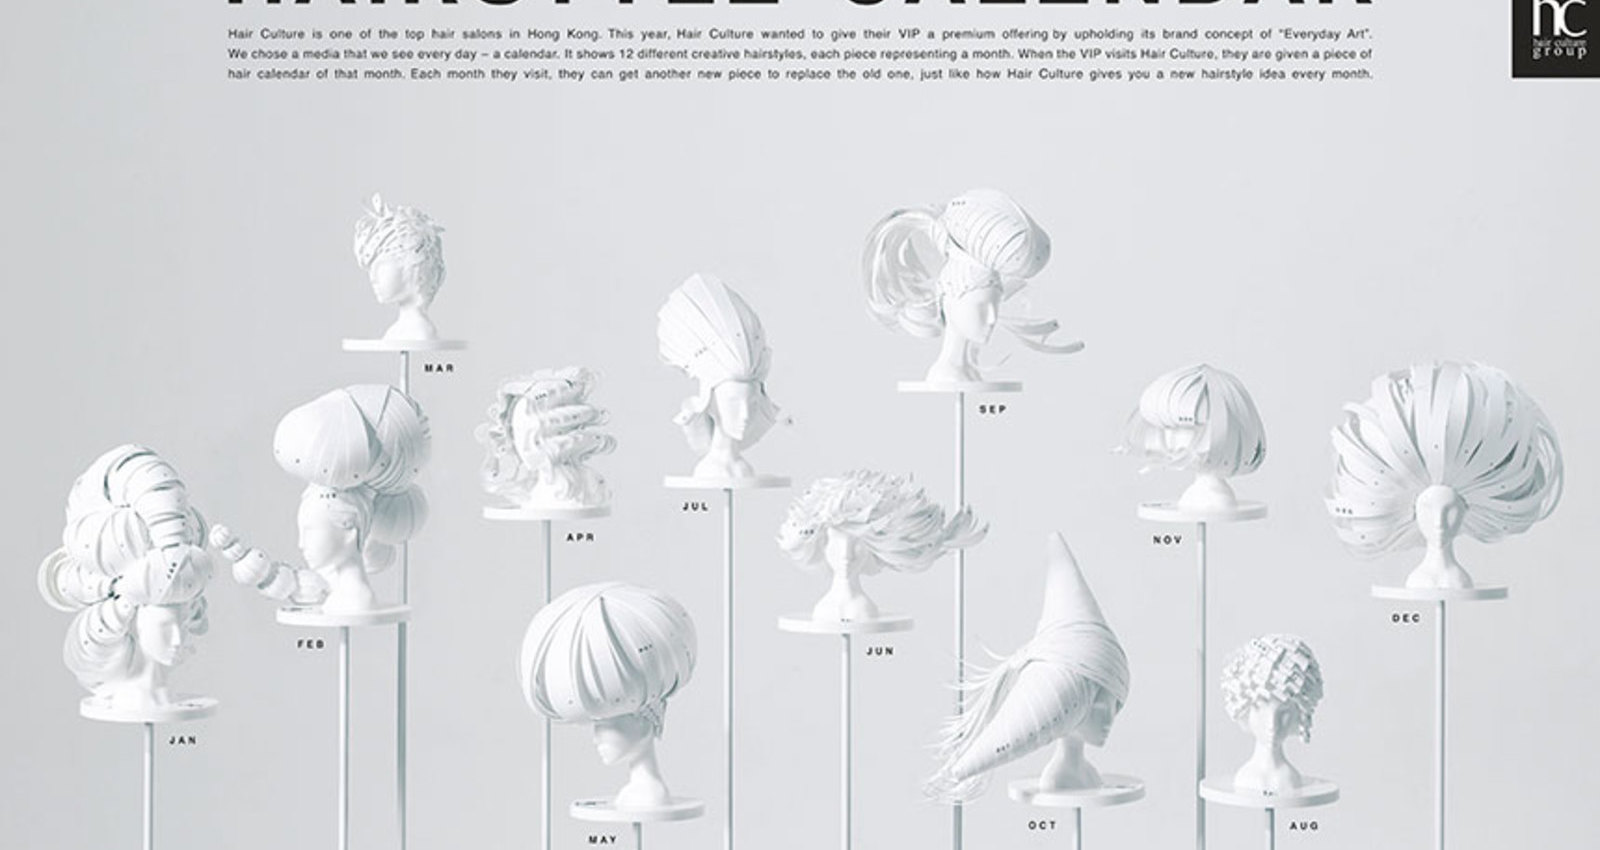 Hairstyle Calendar